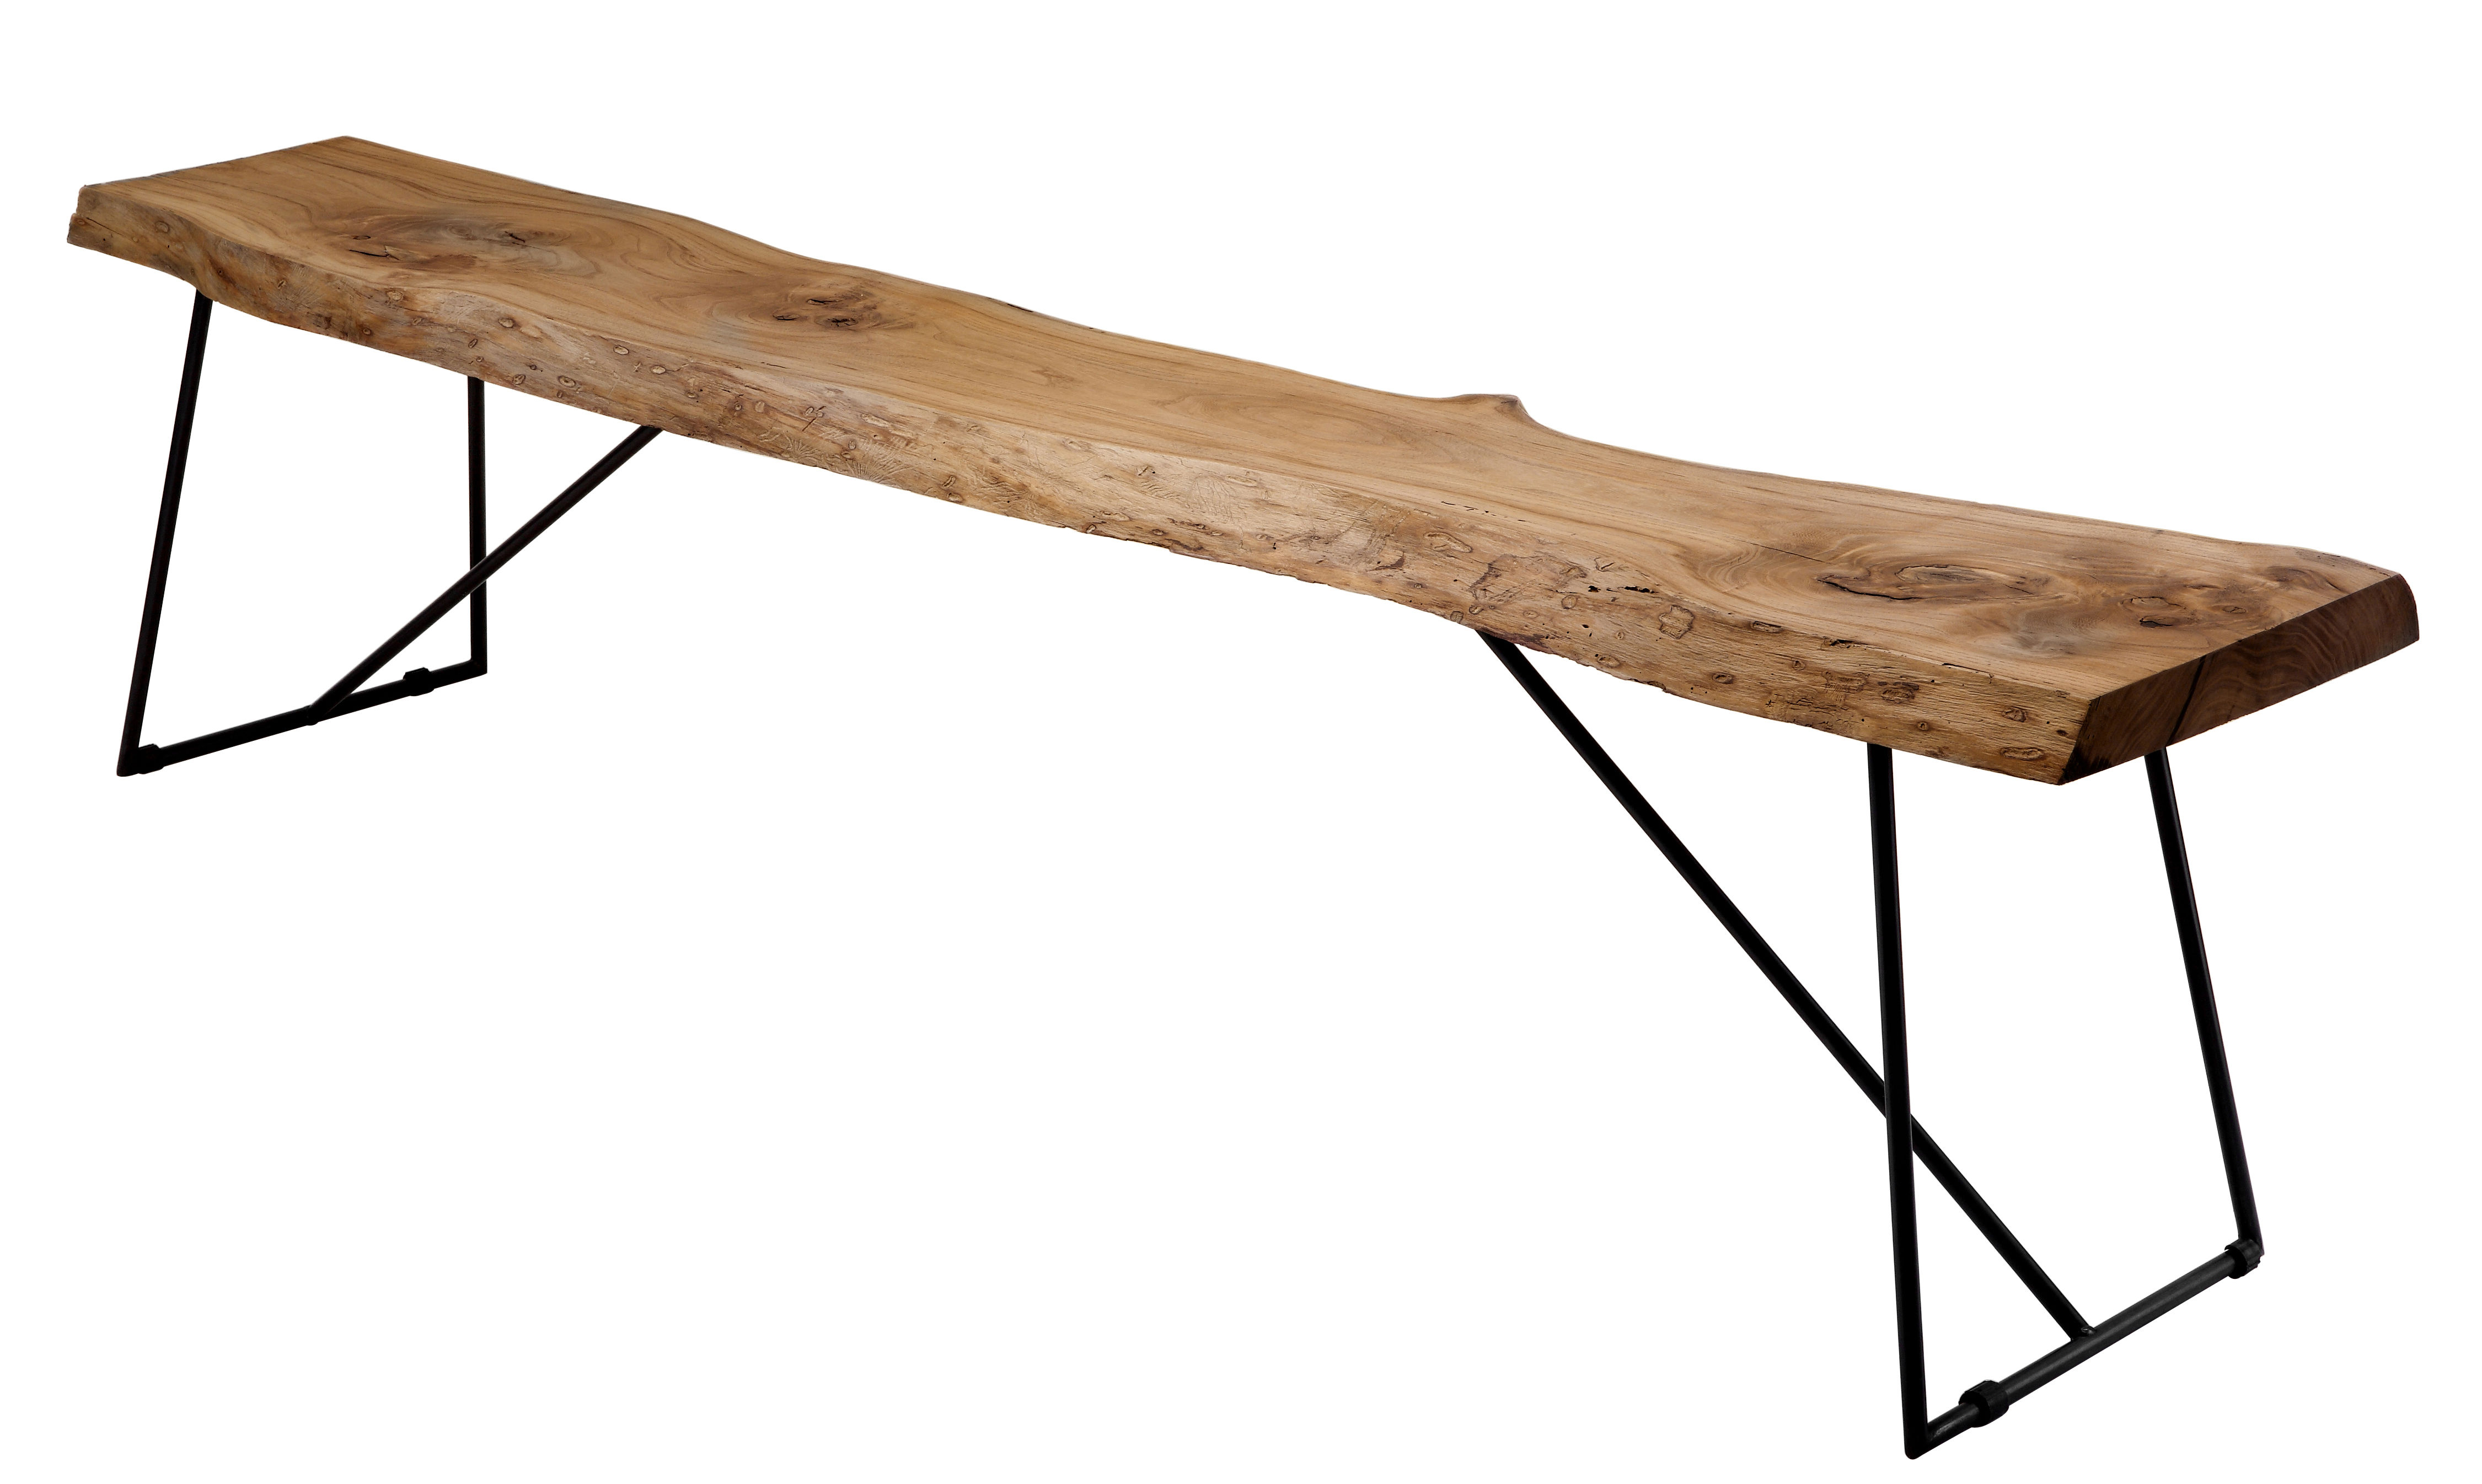 Arredamento - Panchine - Panchina Old Times - / L 190 cm di Zeus - Legno naturale / Struttura nera - Acciaio fosfatato, Olivier massif